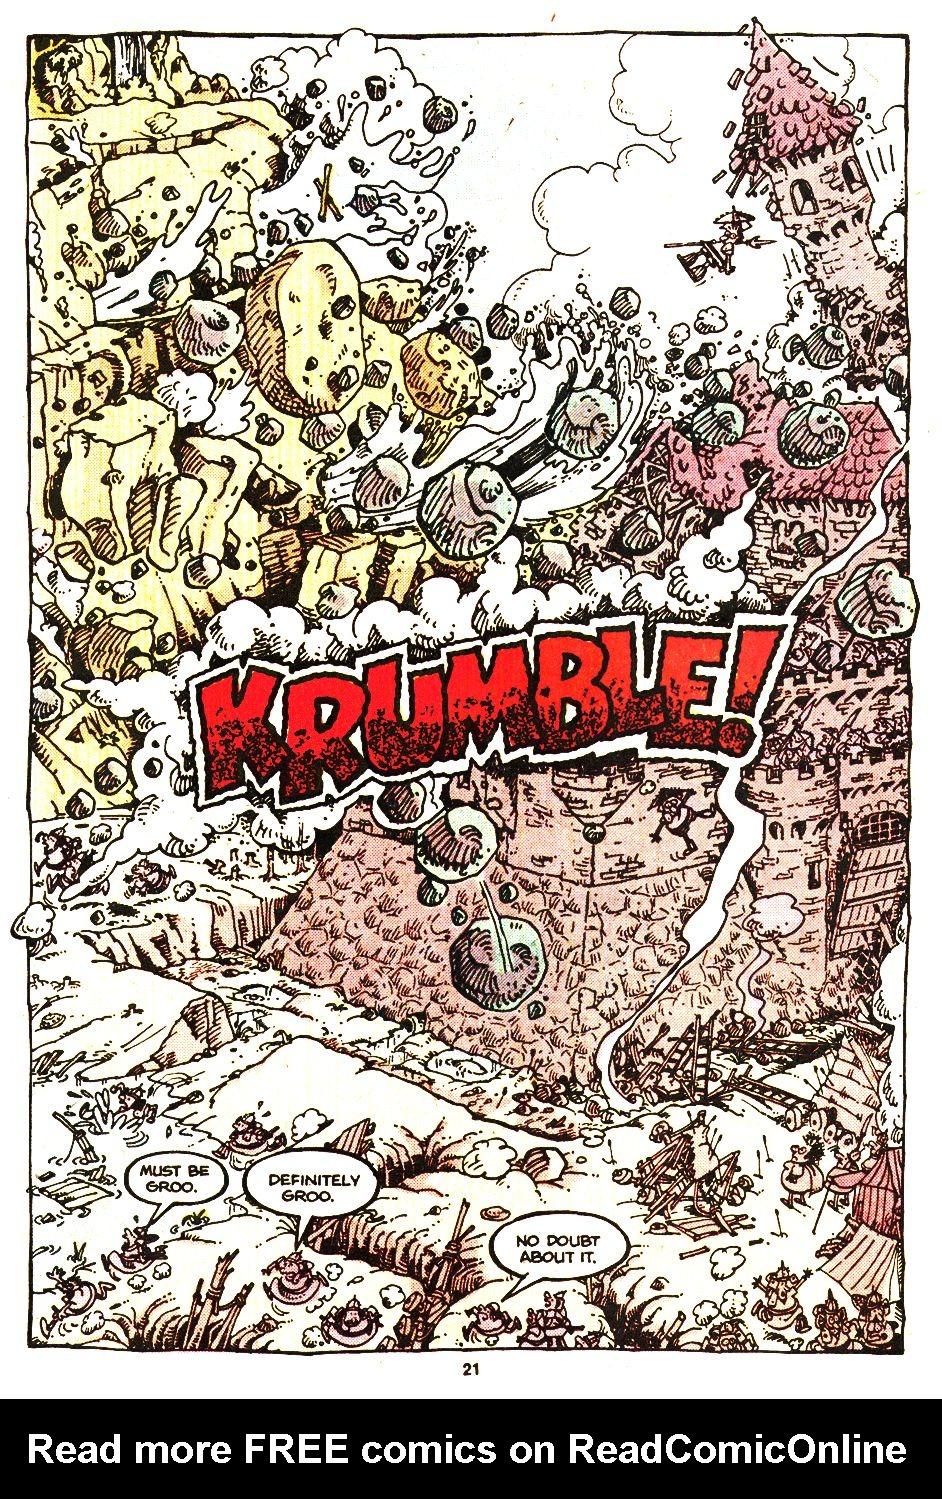 Read online Sergio Aragonés Groo the Wanderer comic -  Issue #20 - 21